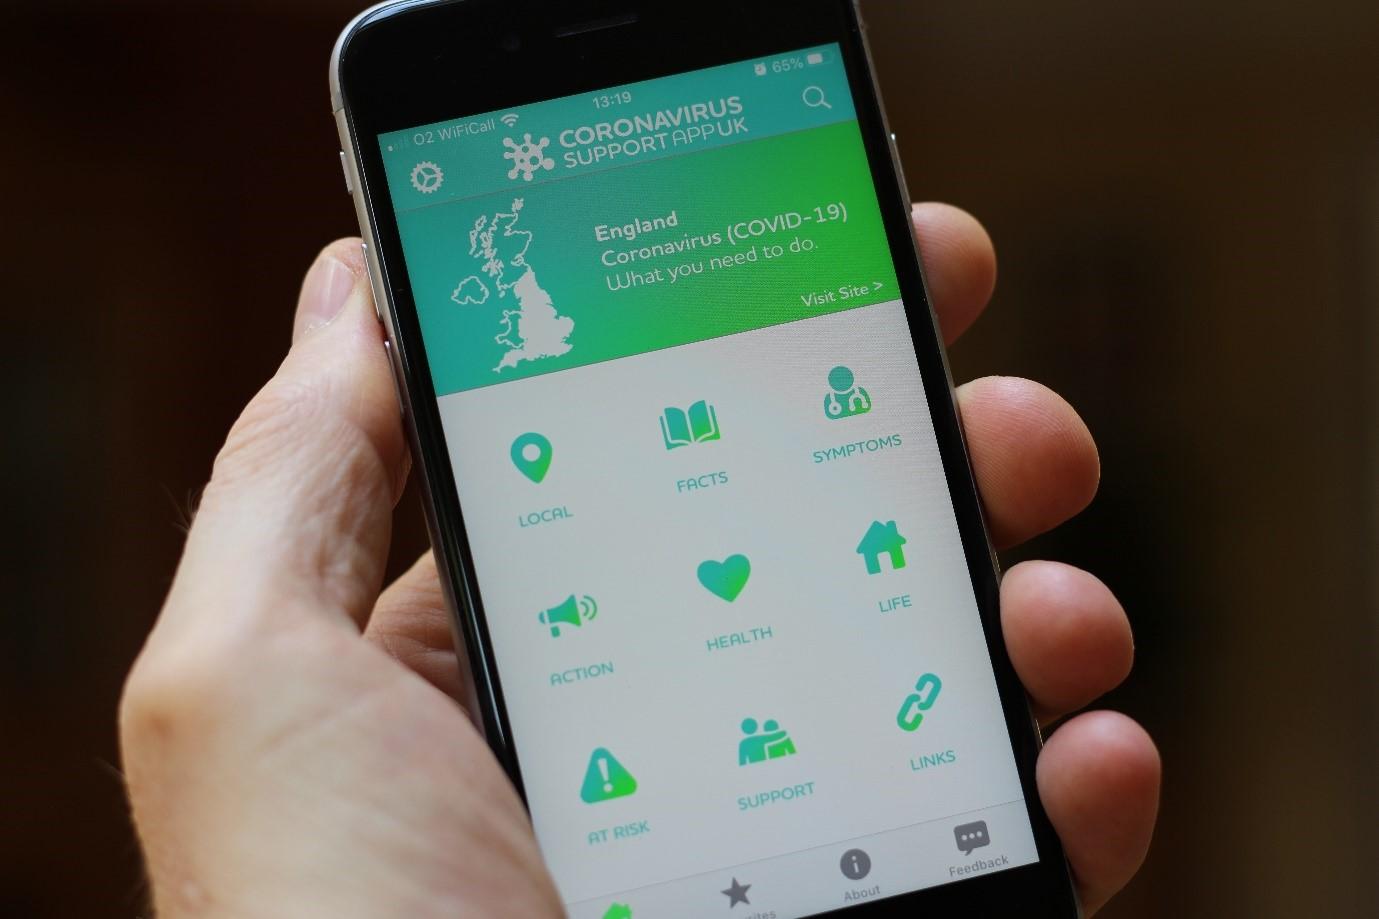 New Coronavirus Support App